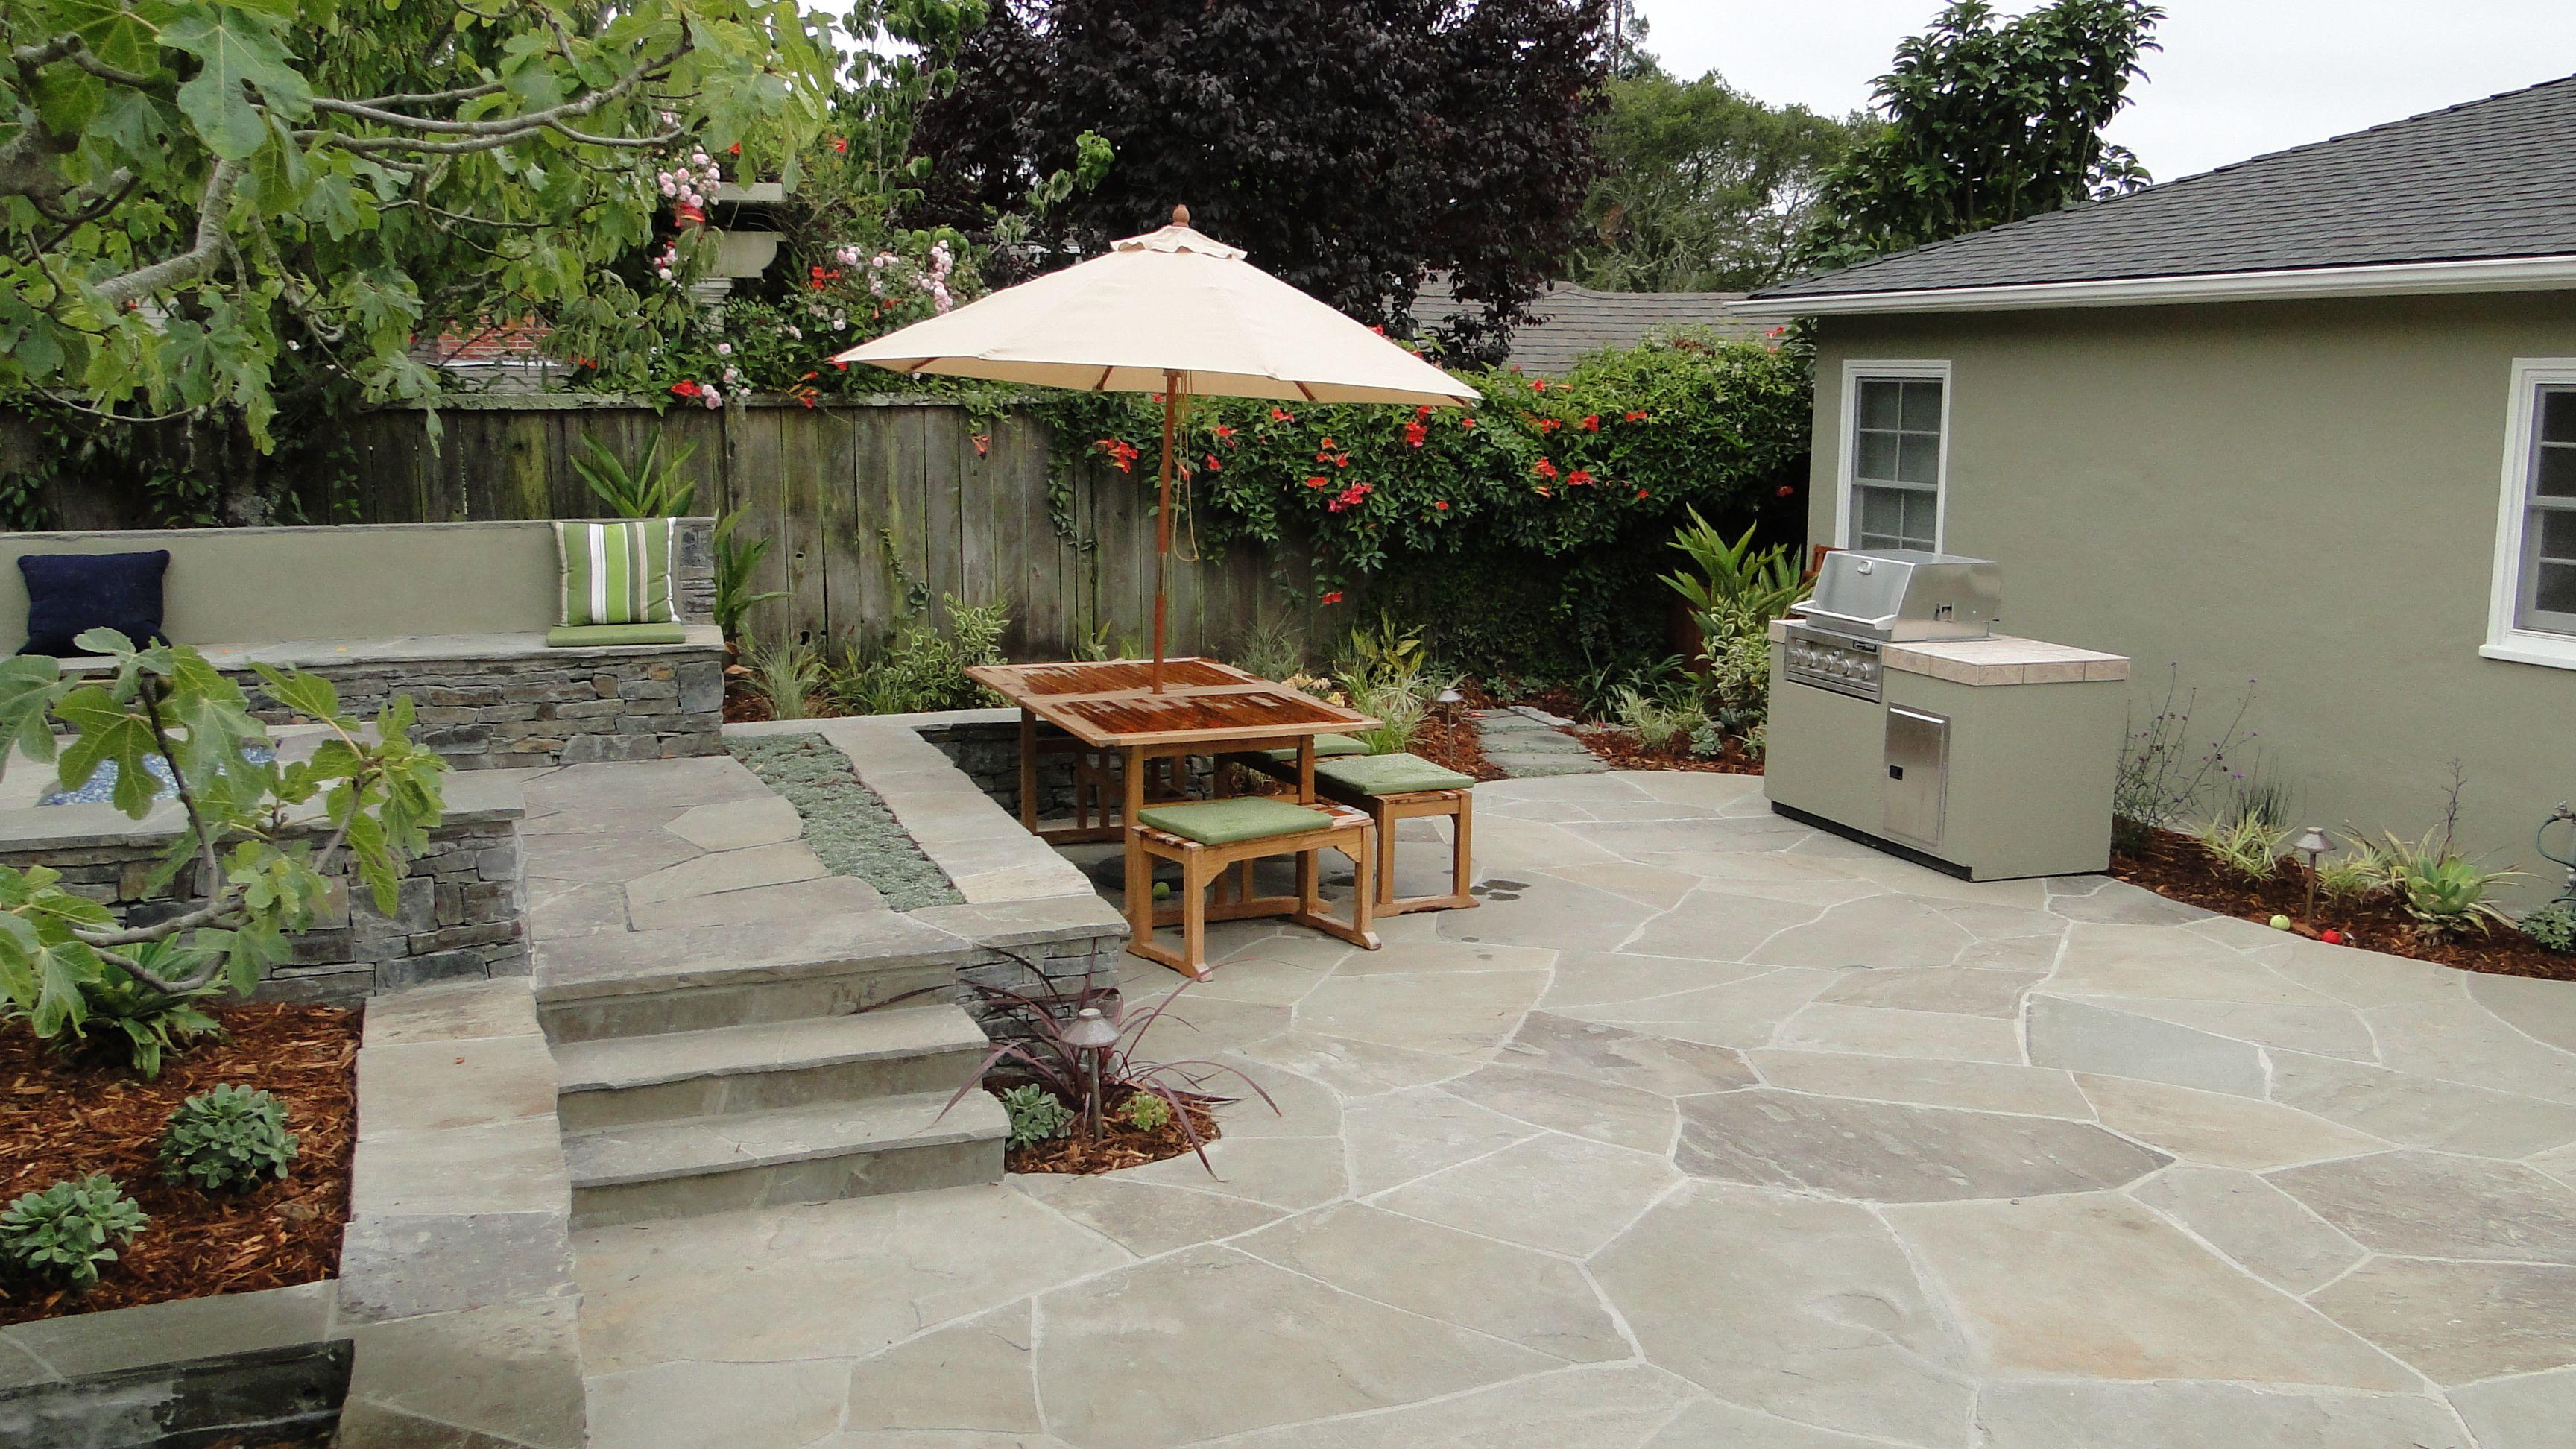 green stucco garden wall - Google Search   Garden wall ... on Green Wall Patio id=43391